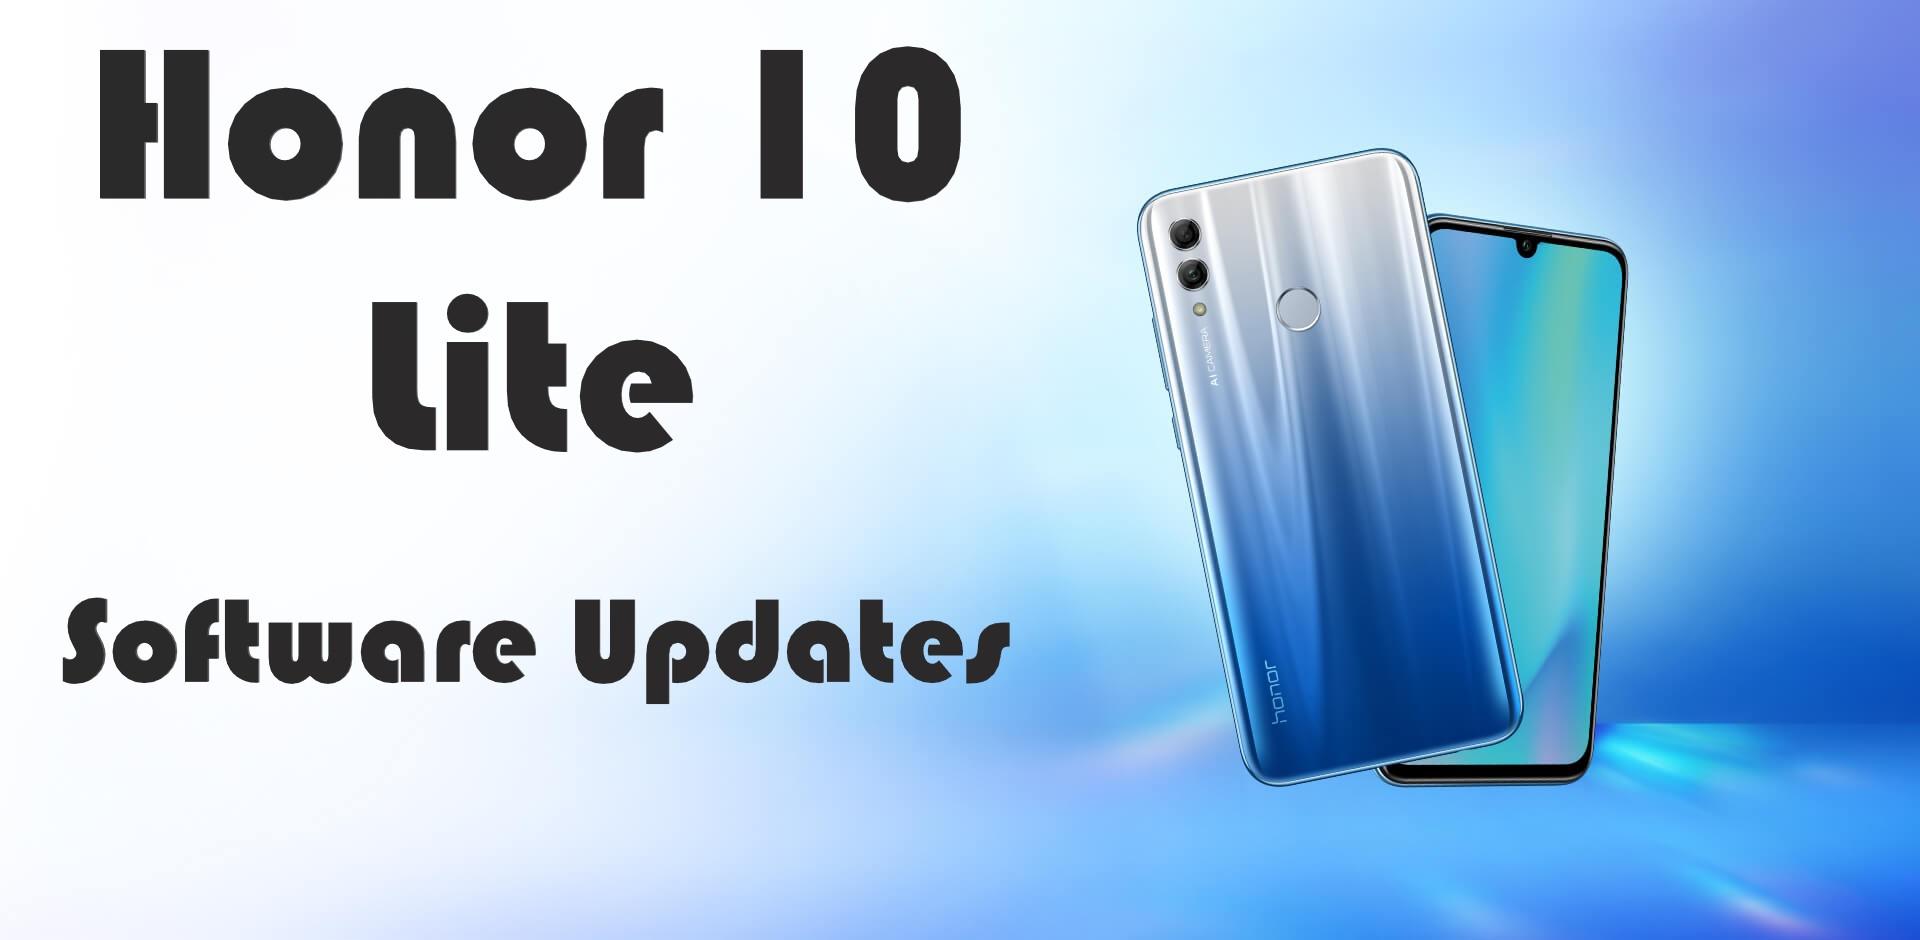 Honor 10 Lite software update